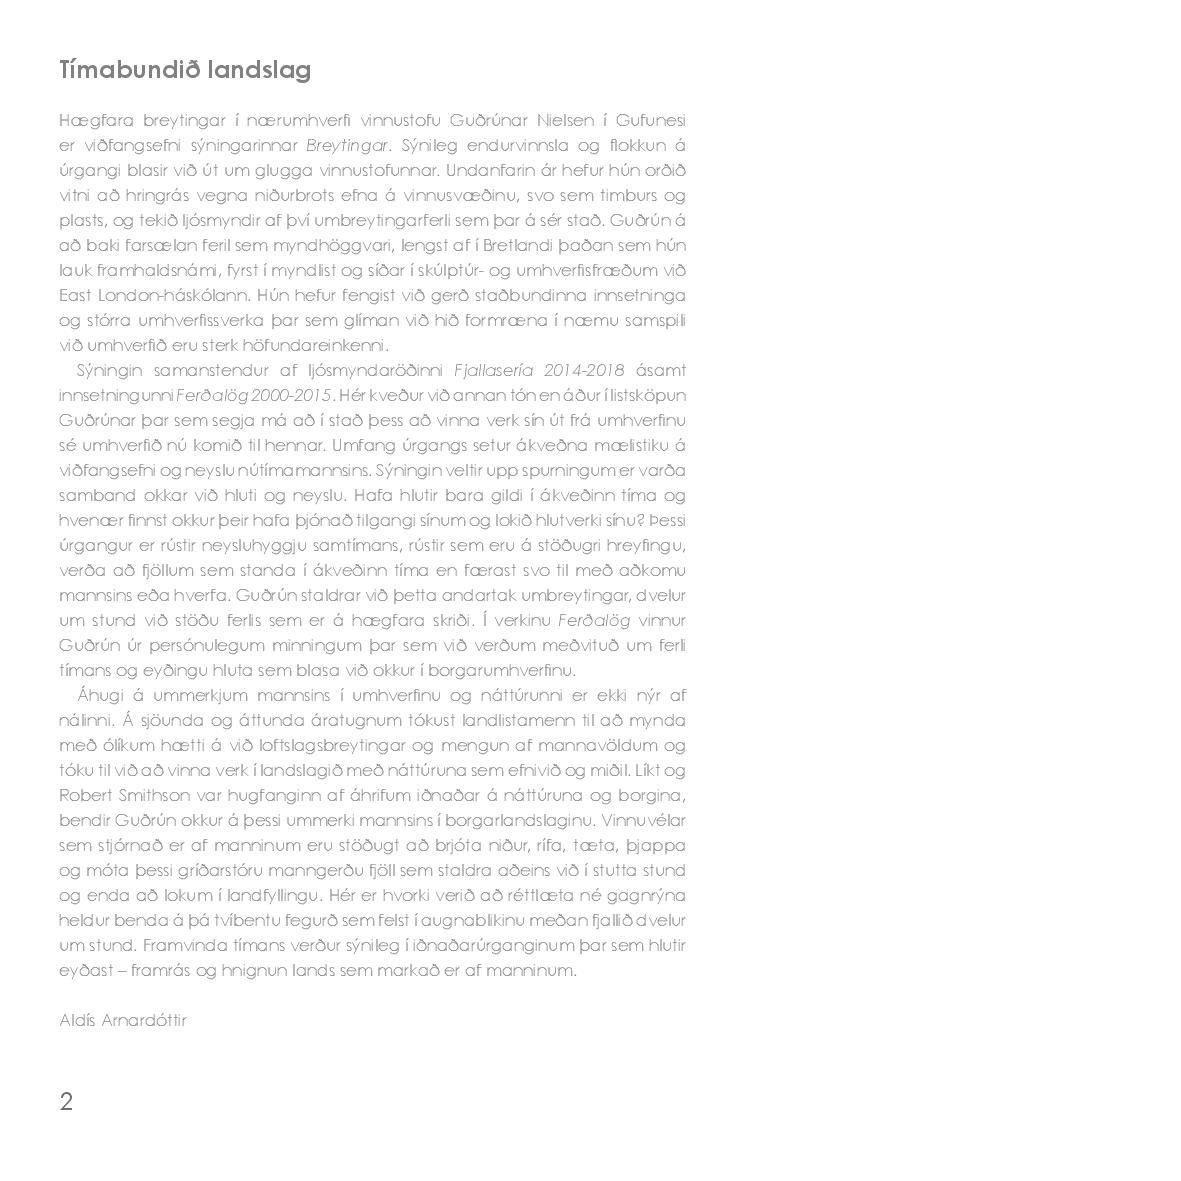 39433_GudrunNielsen-page-002.jpg